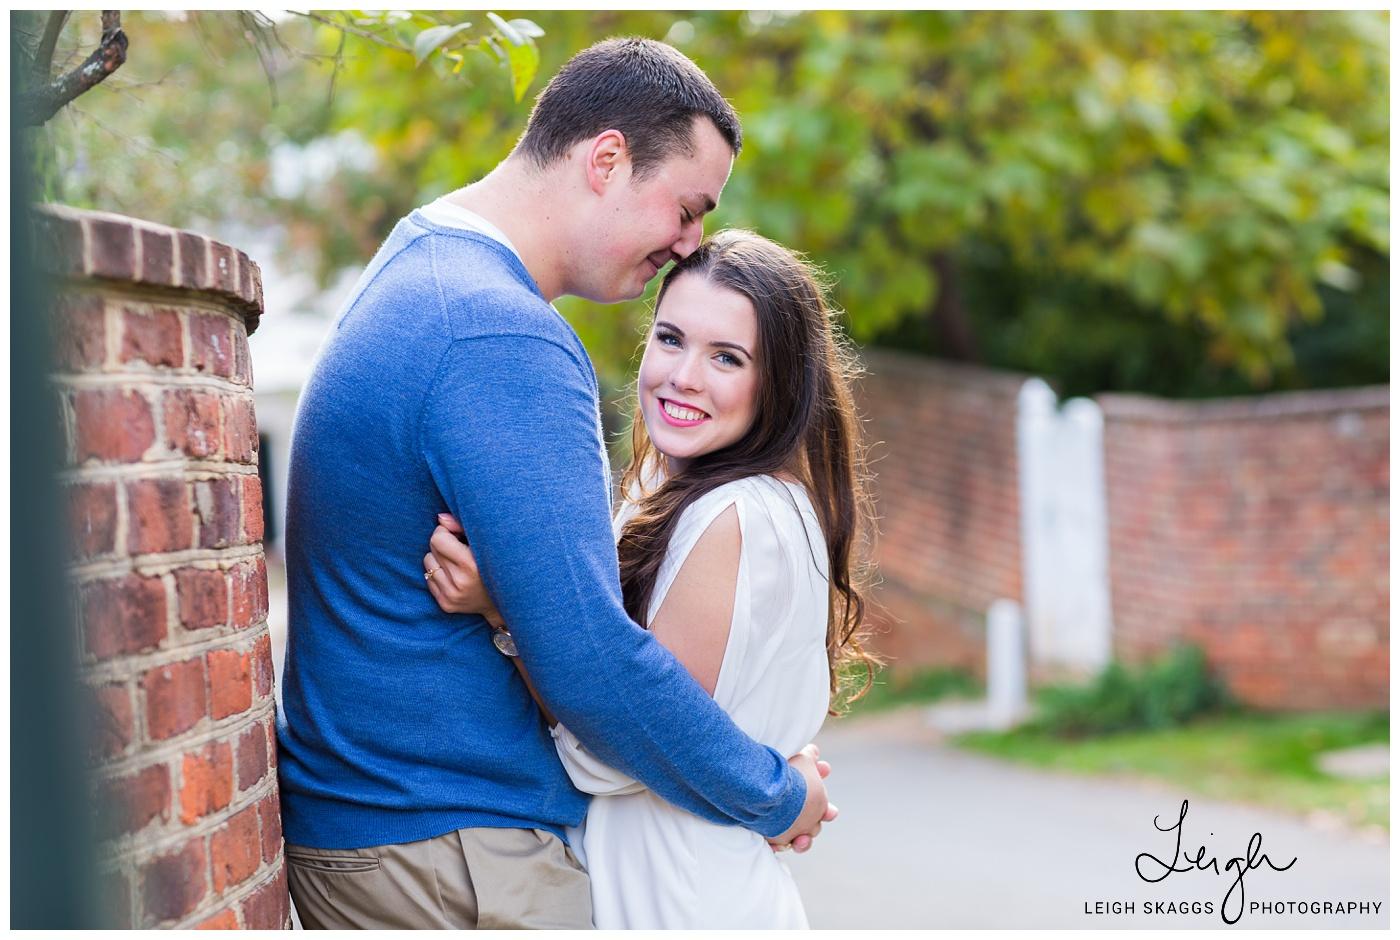 Katie & Tim | UVA Engagement Session